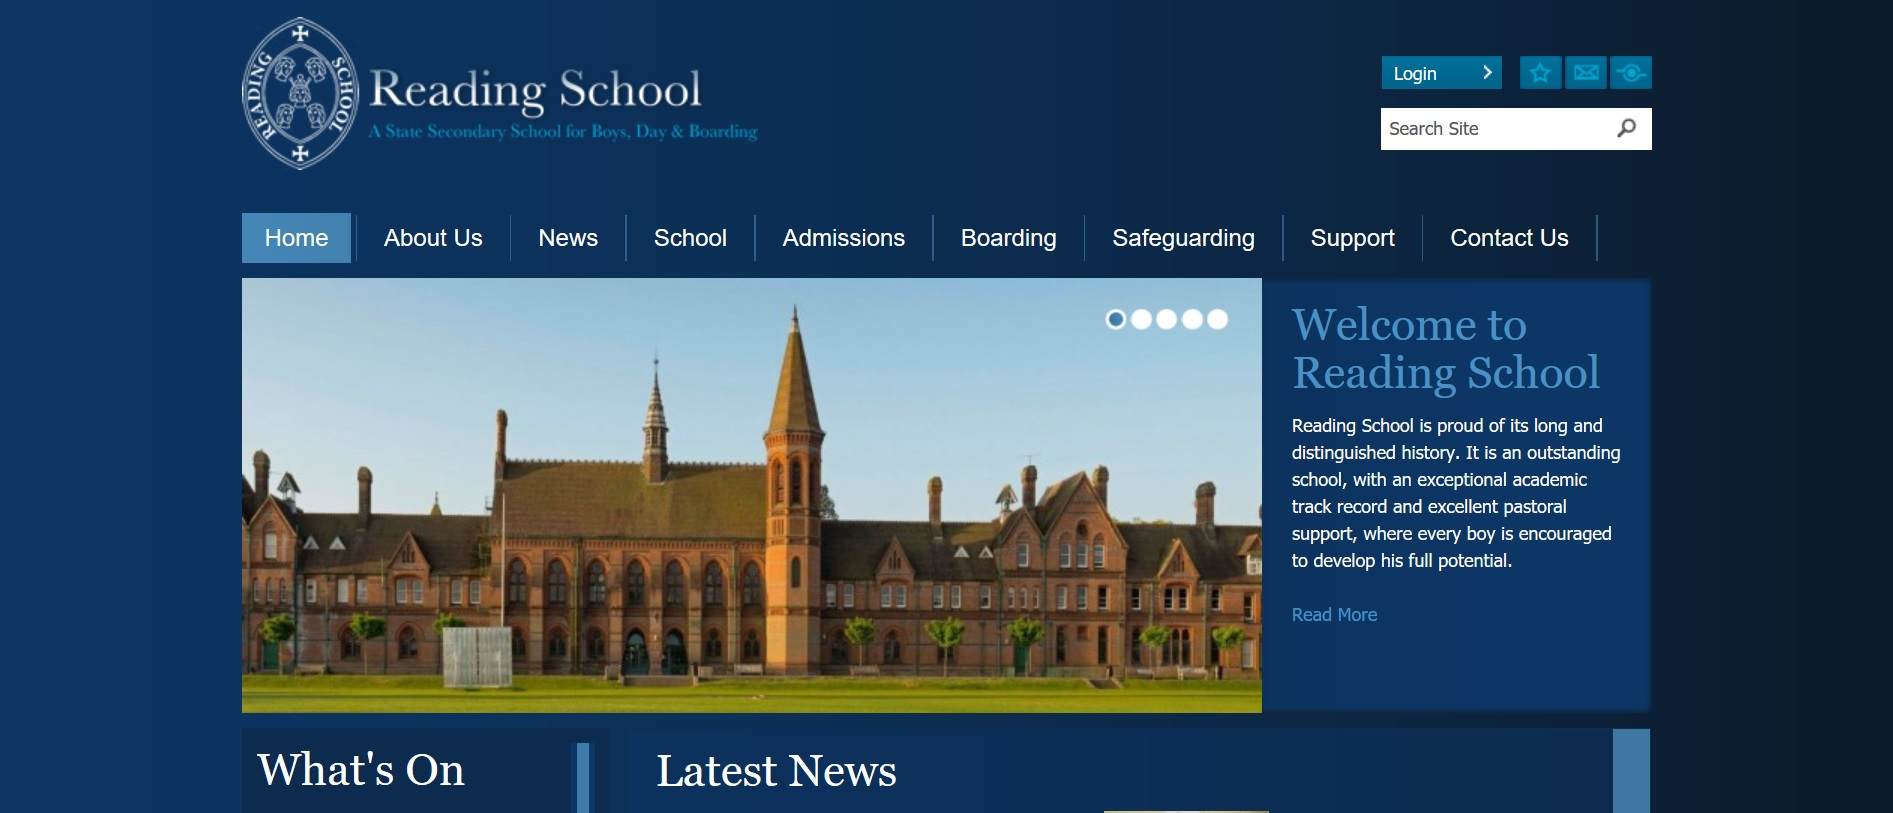 Screenshot of Reading School homepage